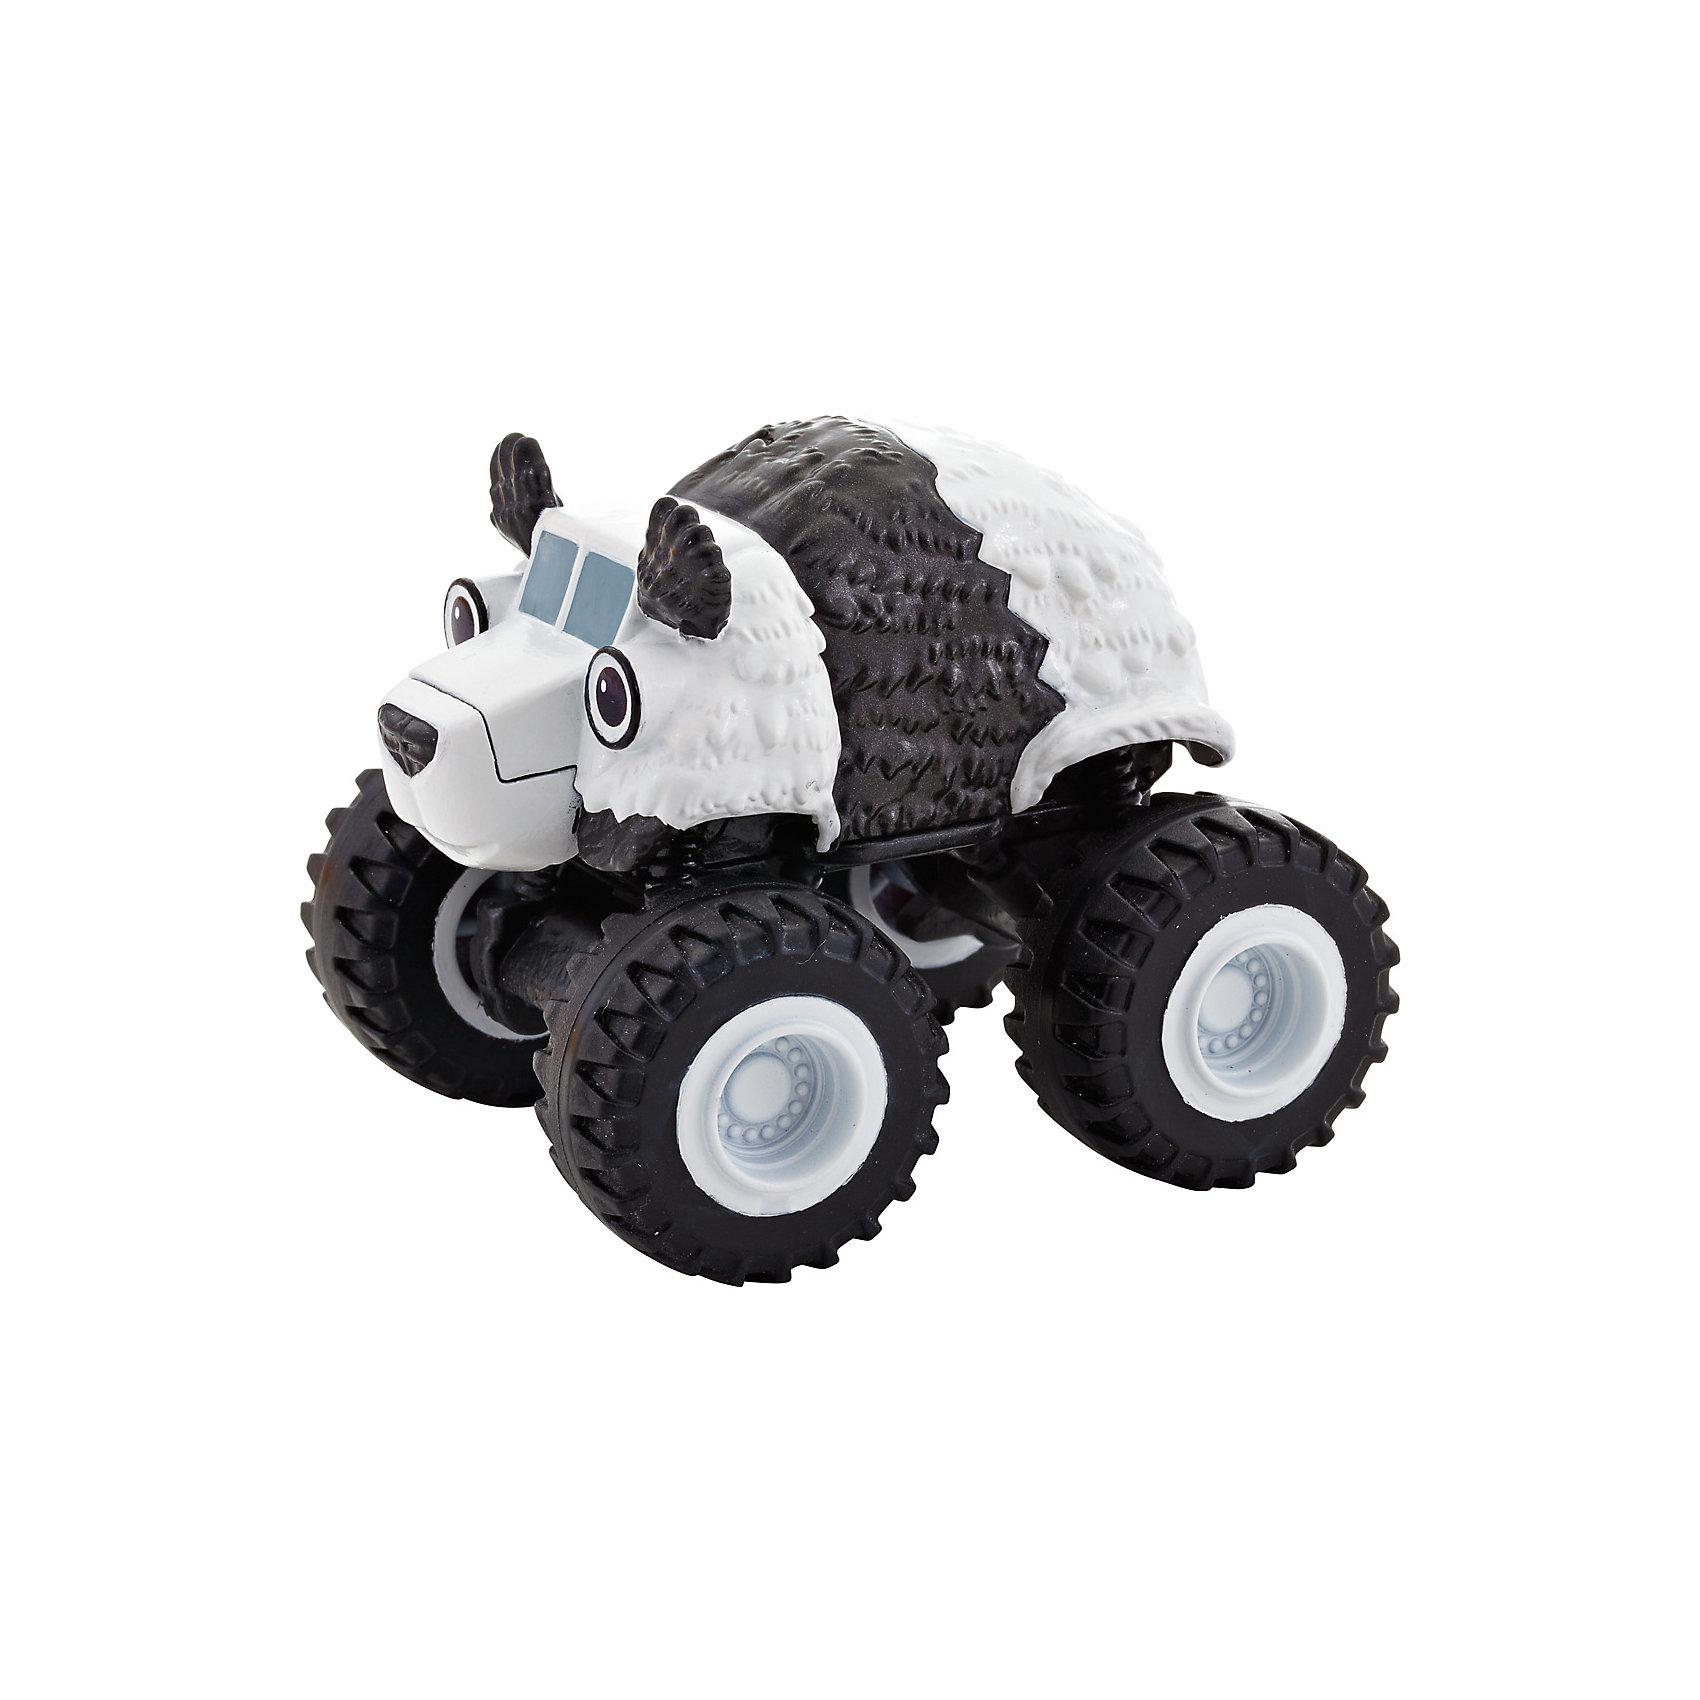 Mattel Панда, Fisher Price, Вспыш и чудо-машинки mattel панда fisher price вспыш и чудо машинки